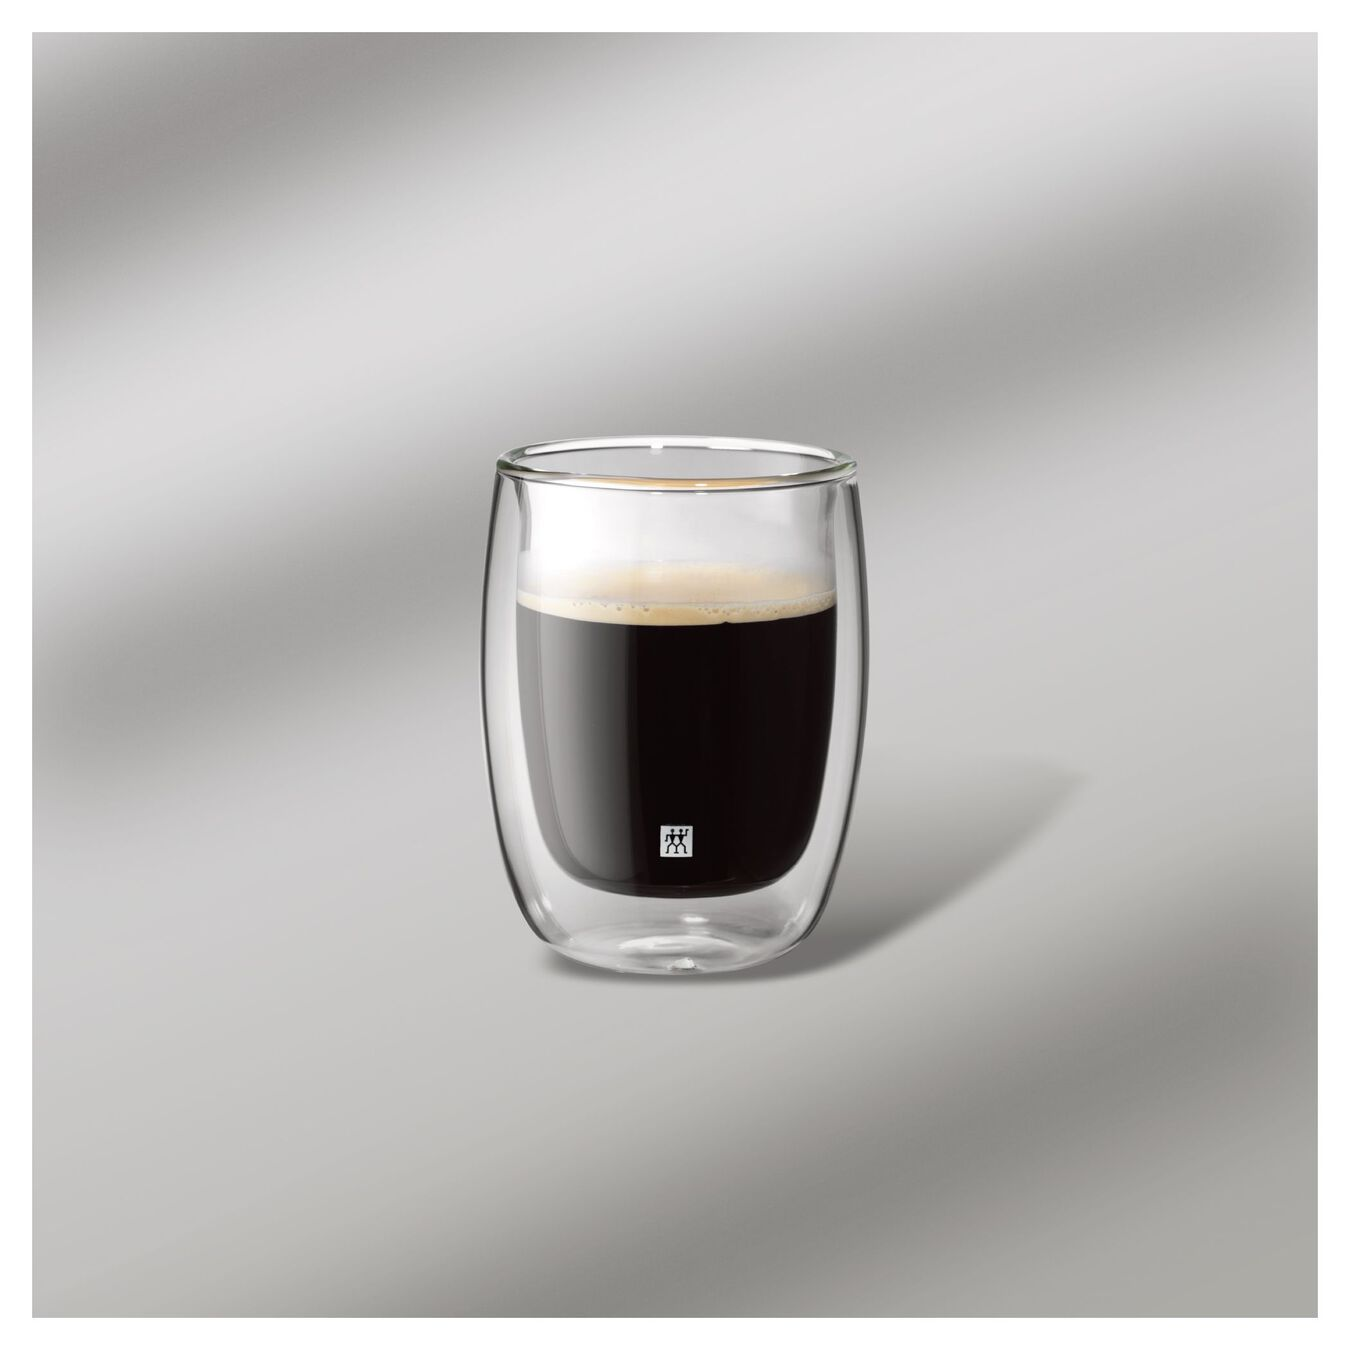 Çift Camlı Kahve bardağı seti, 2-parça,,large 2